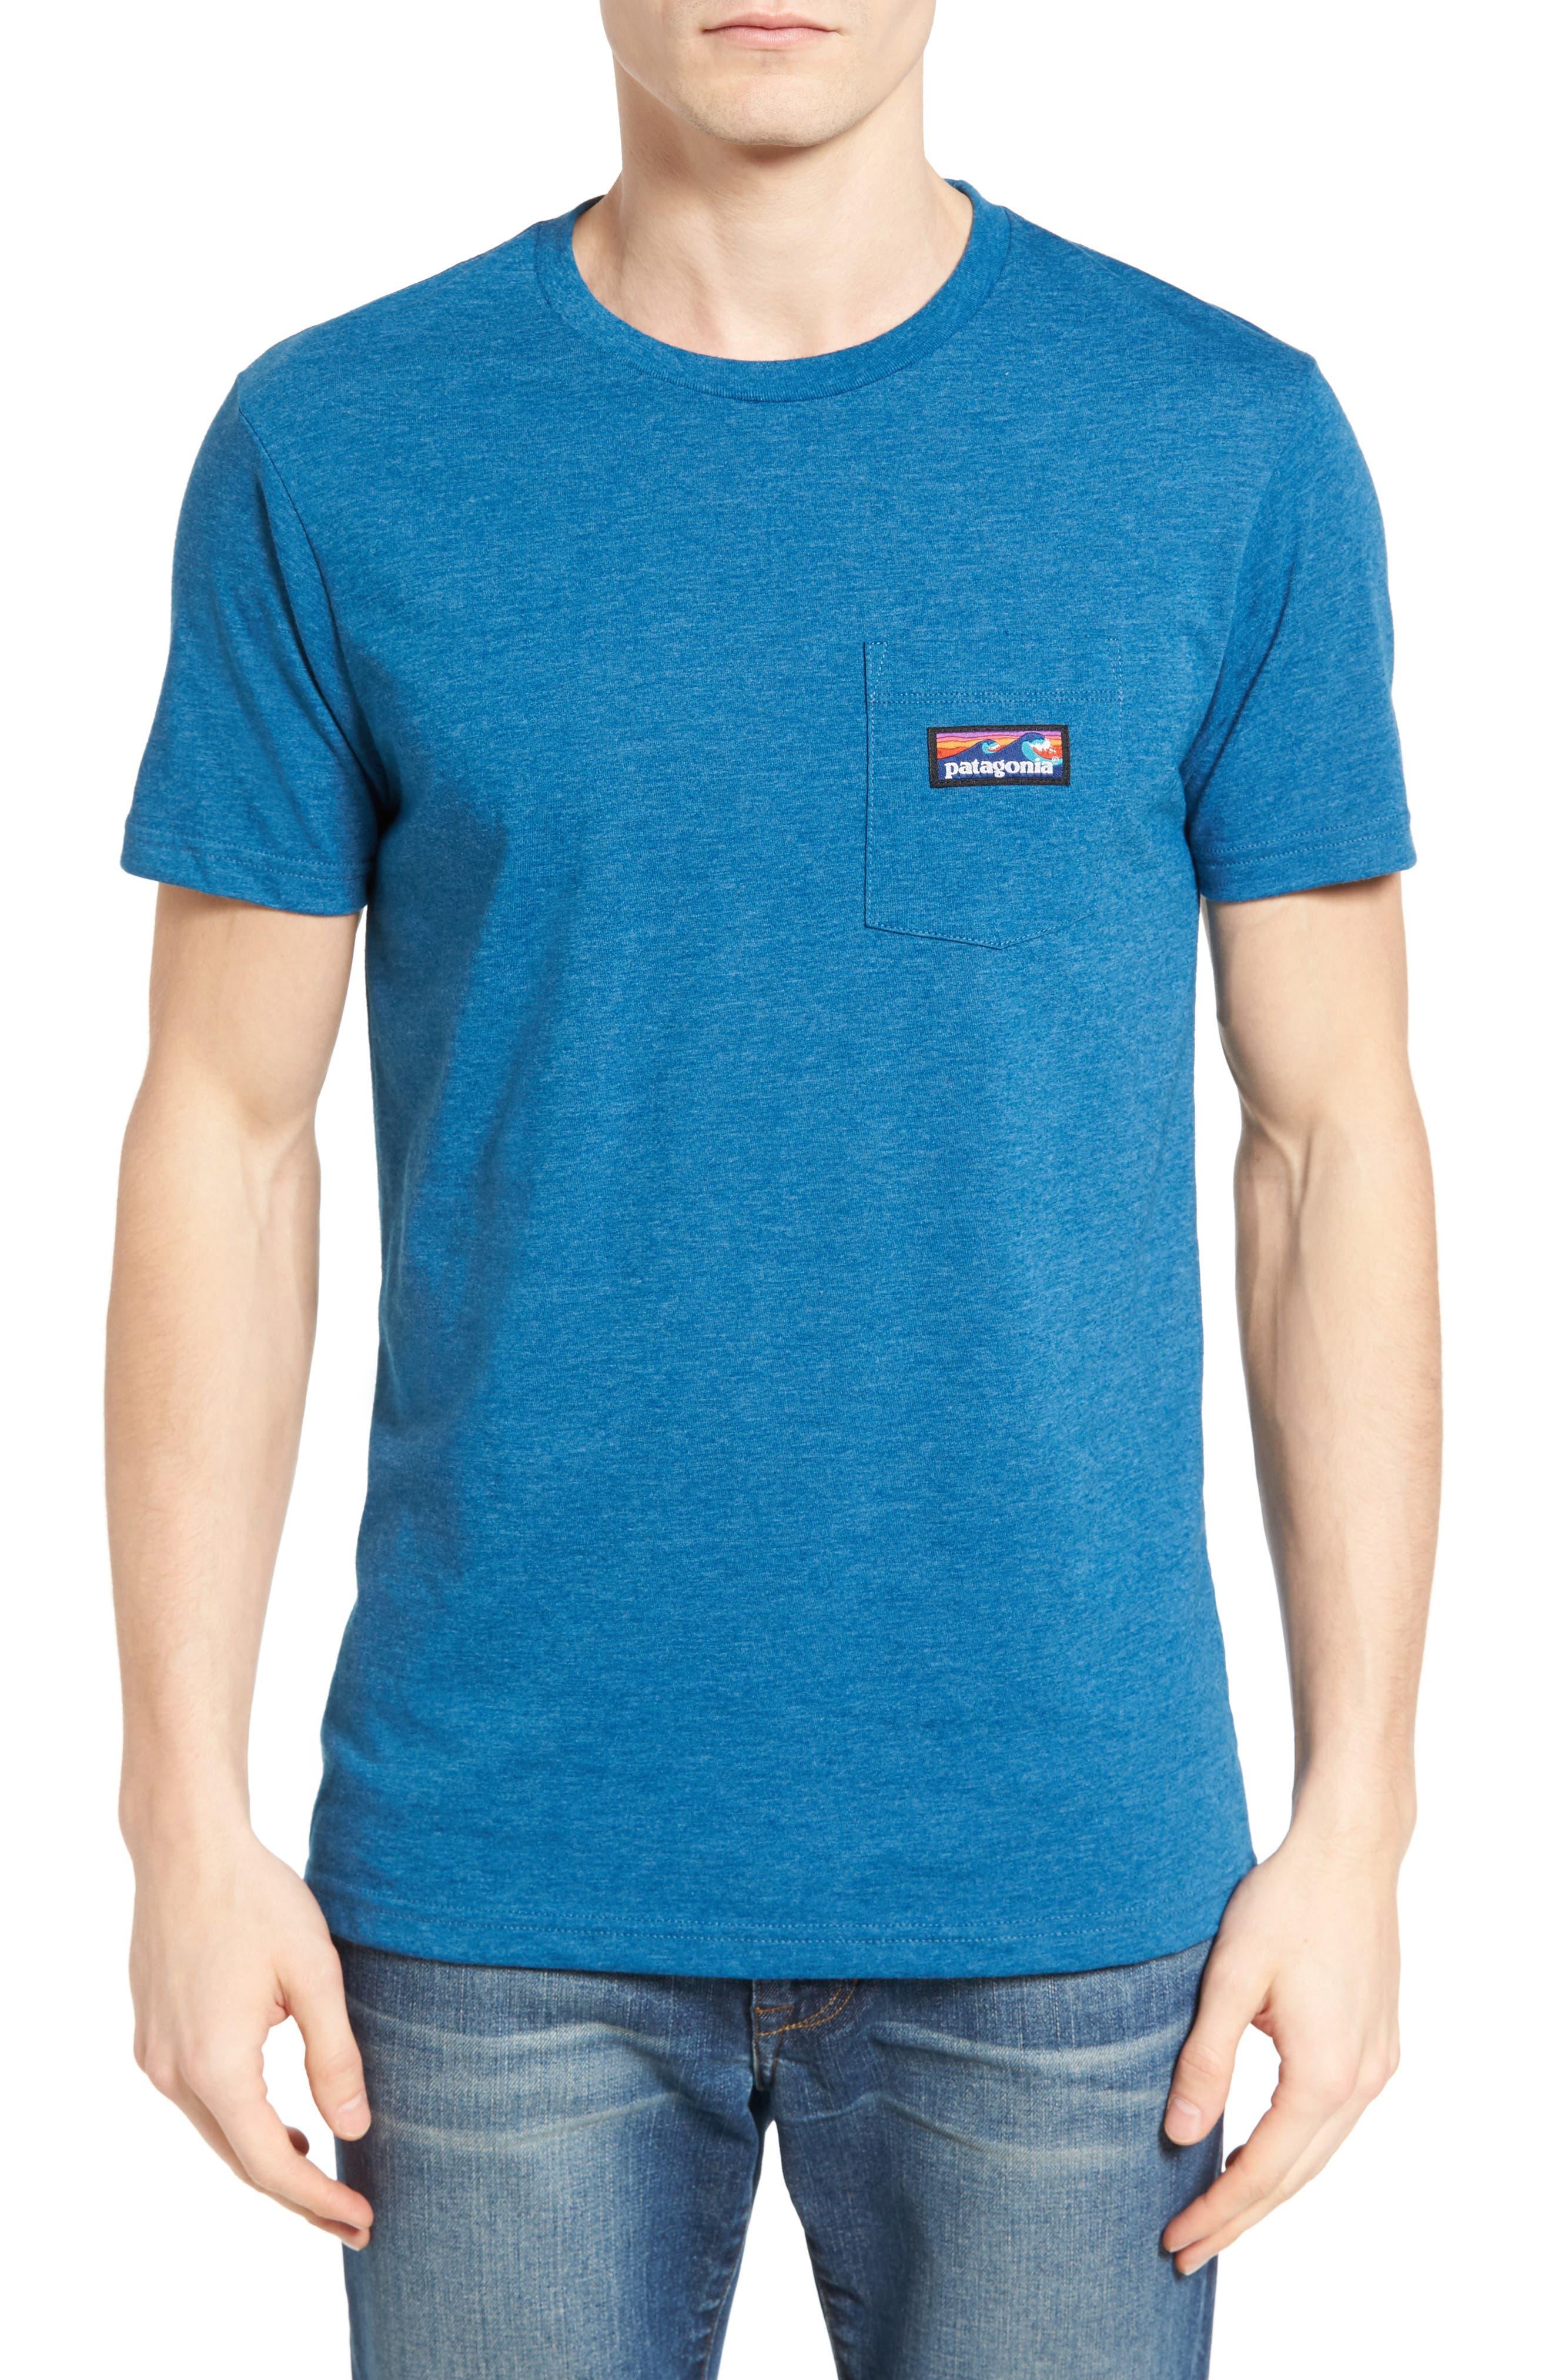 Main Image - Patagonia Board Short Label T-Shirt